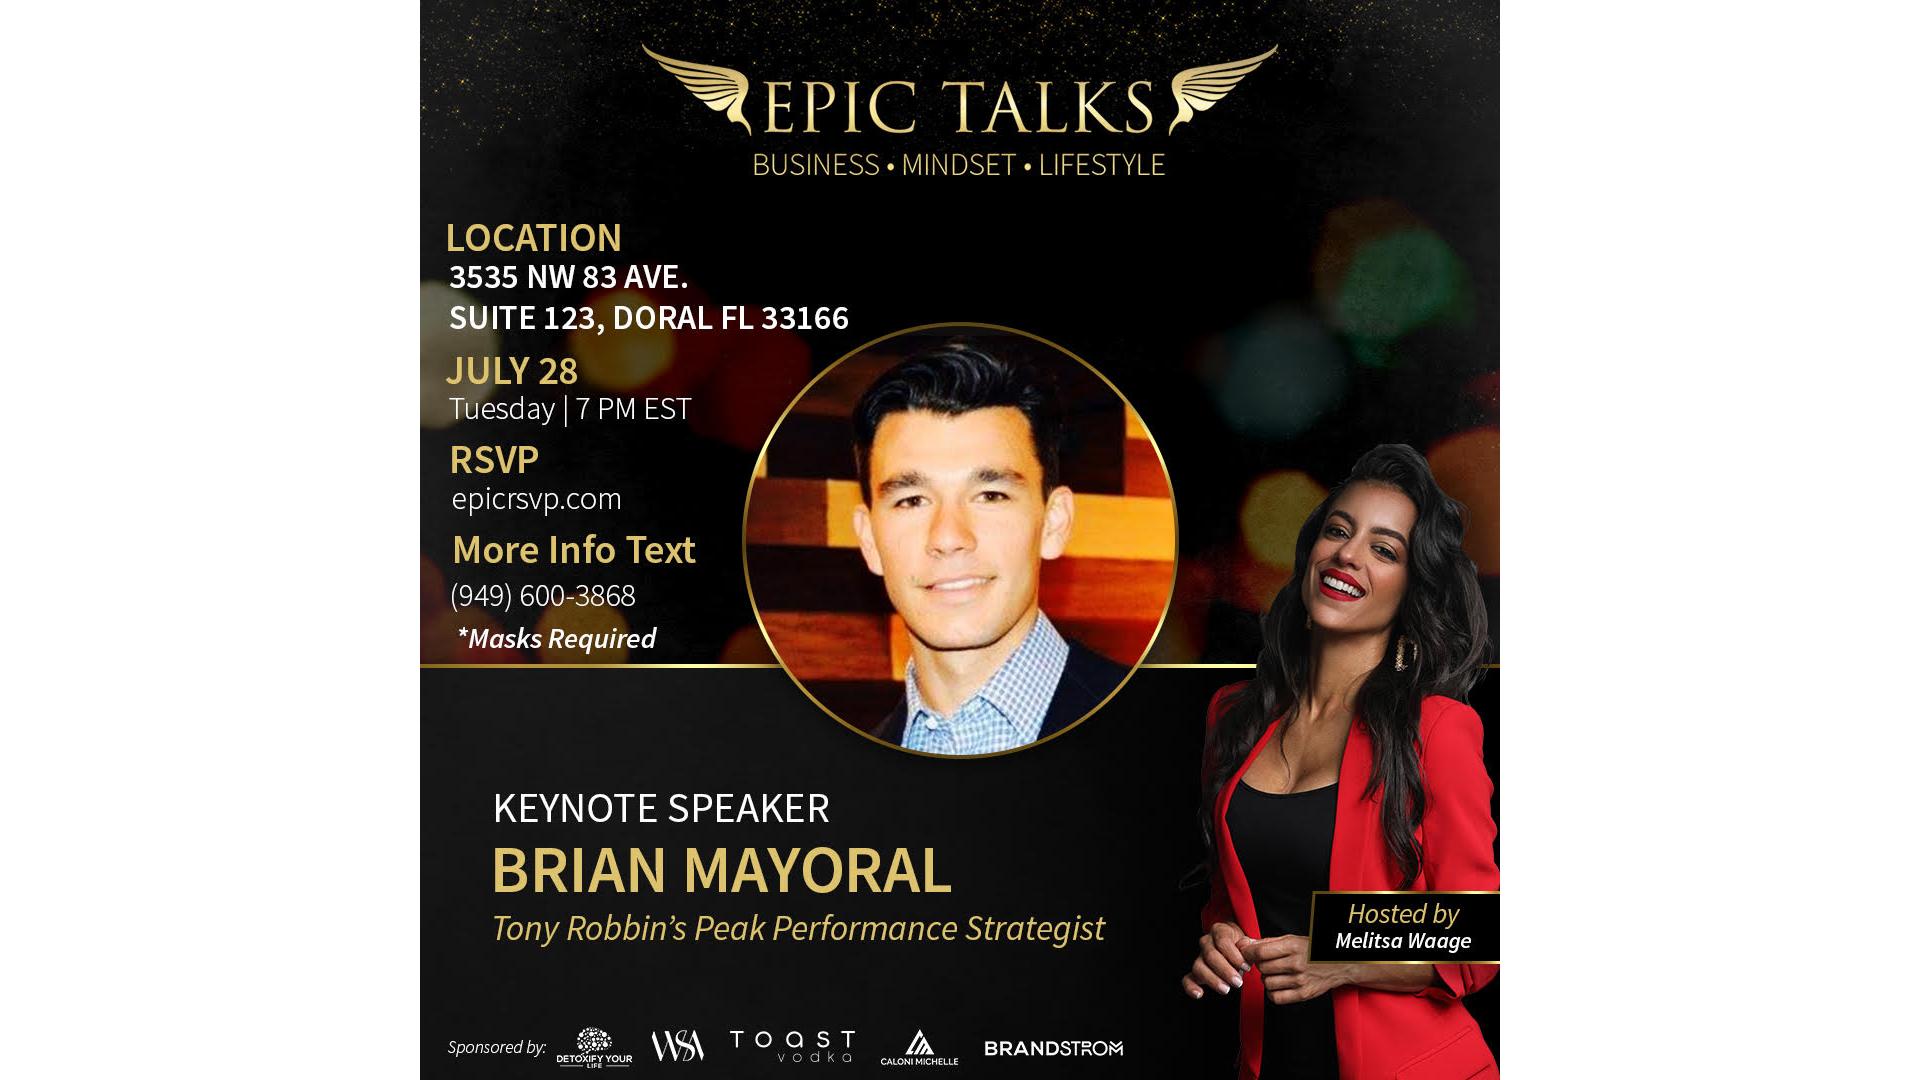 Thumbnail for Epic Talks - July on ViewStub